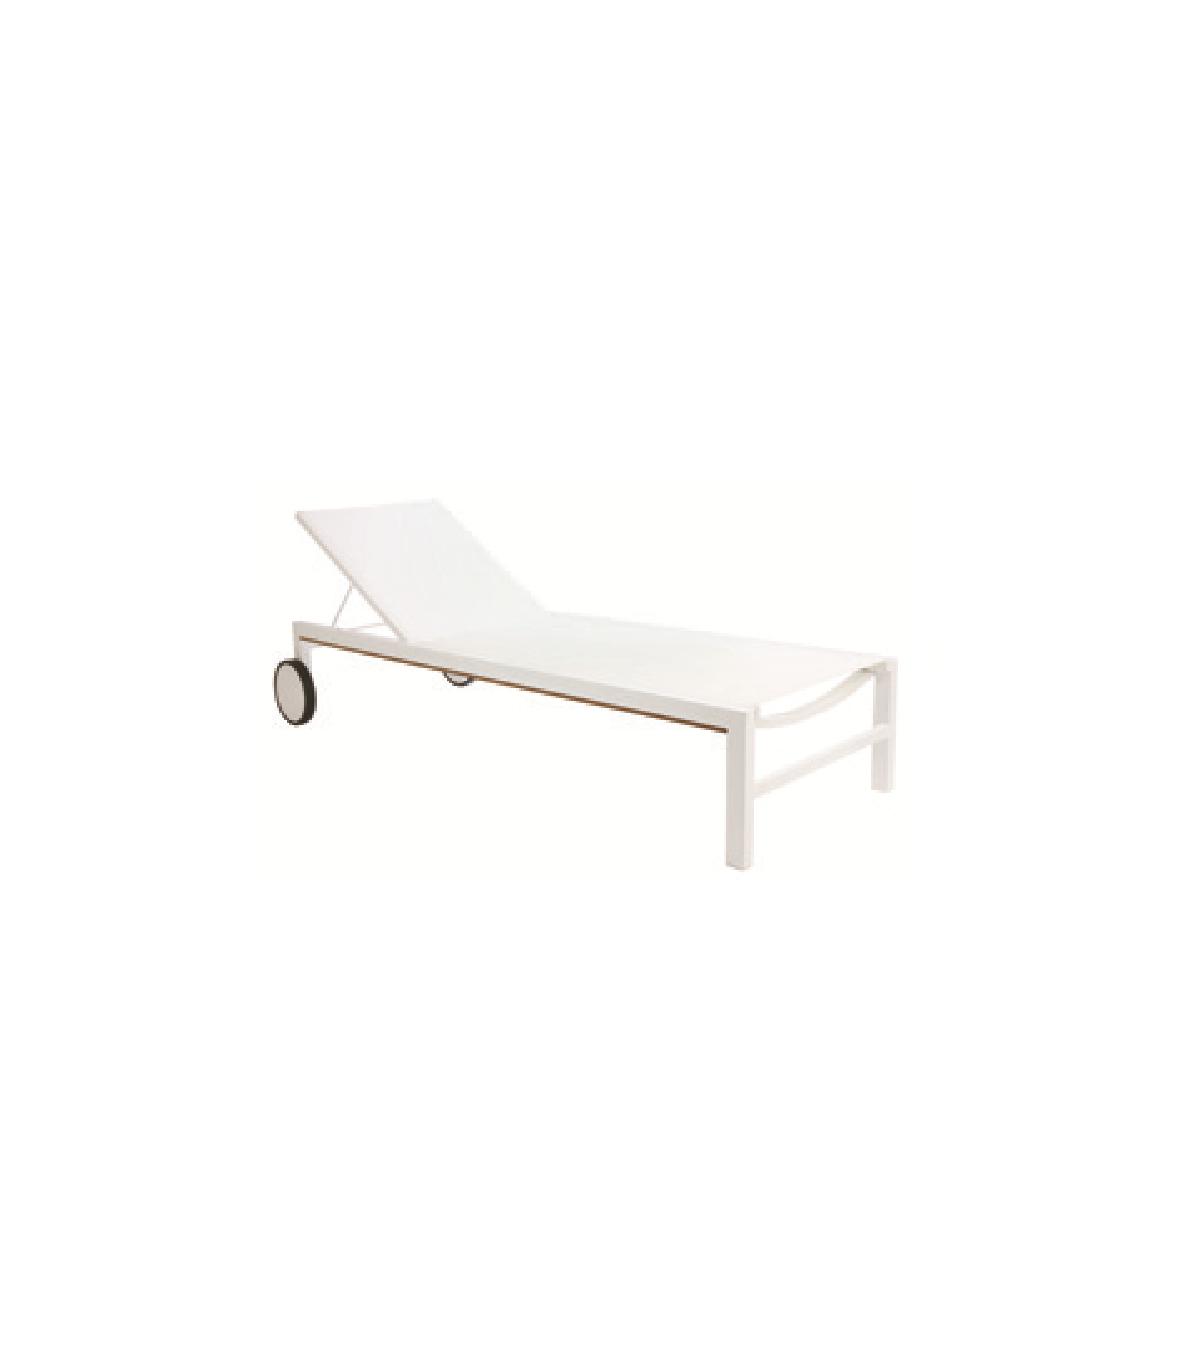 bain de soleil alu shio textil ne res. Black Bedroom Furniture Sets. Home Design Ideas